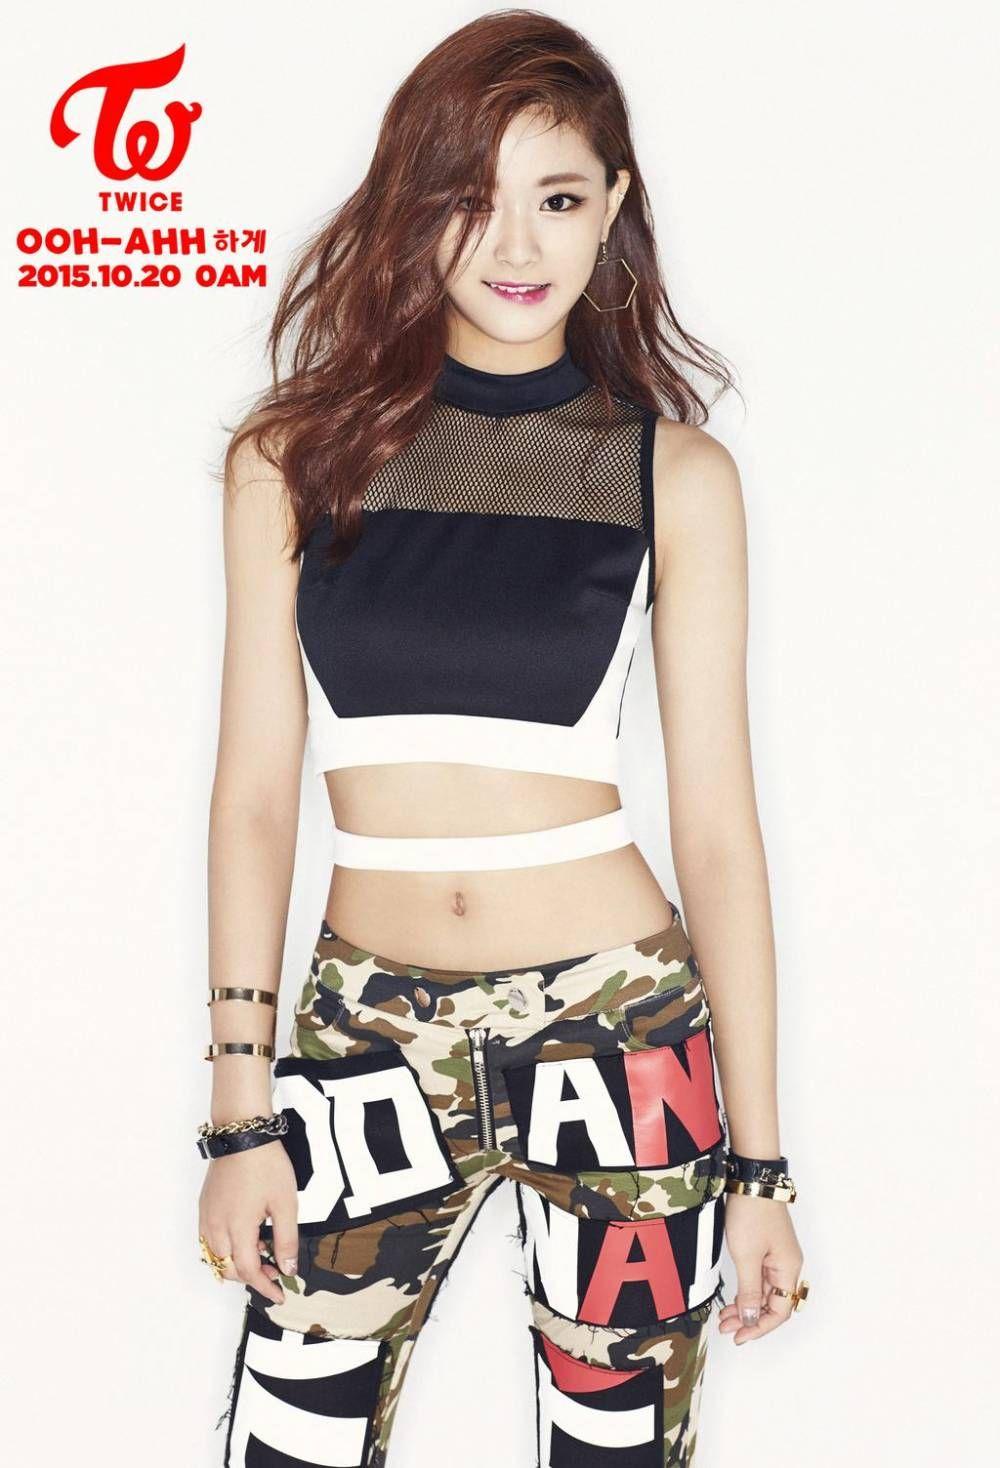 Jyp Entertainment Squashes Rumors Of Tzuyu Contract Buyout Schedule Unchanged Kpop Girls Kpop Fashion Korean Fashion